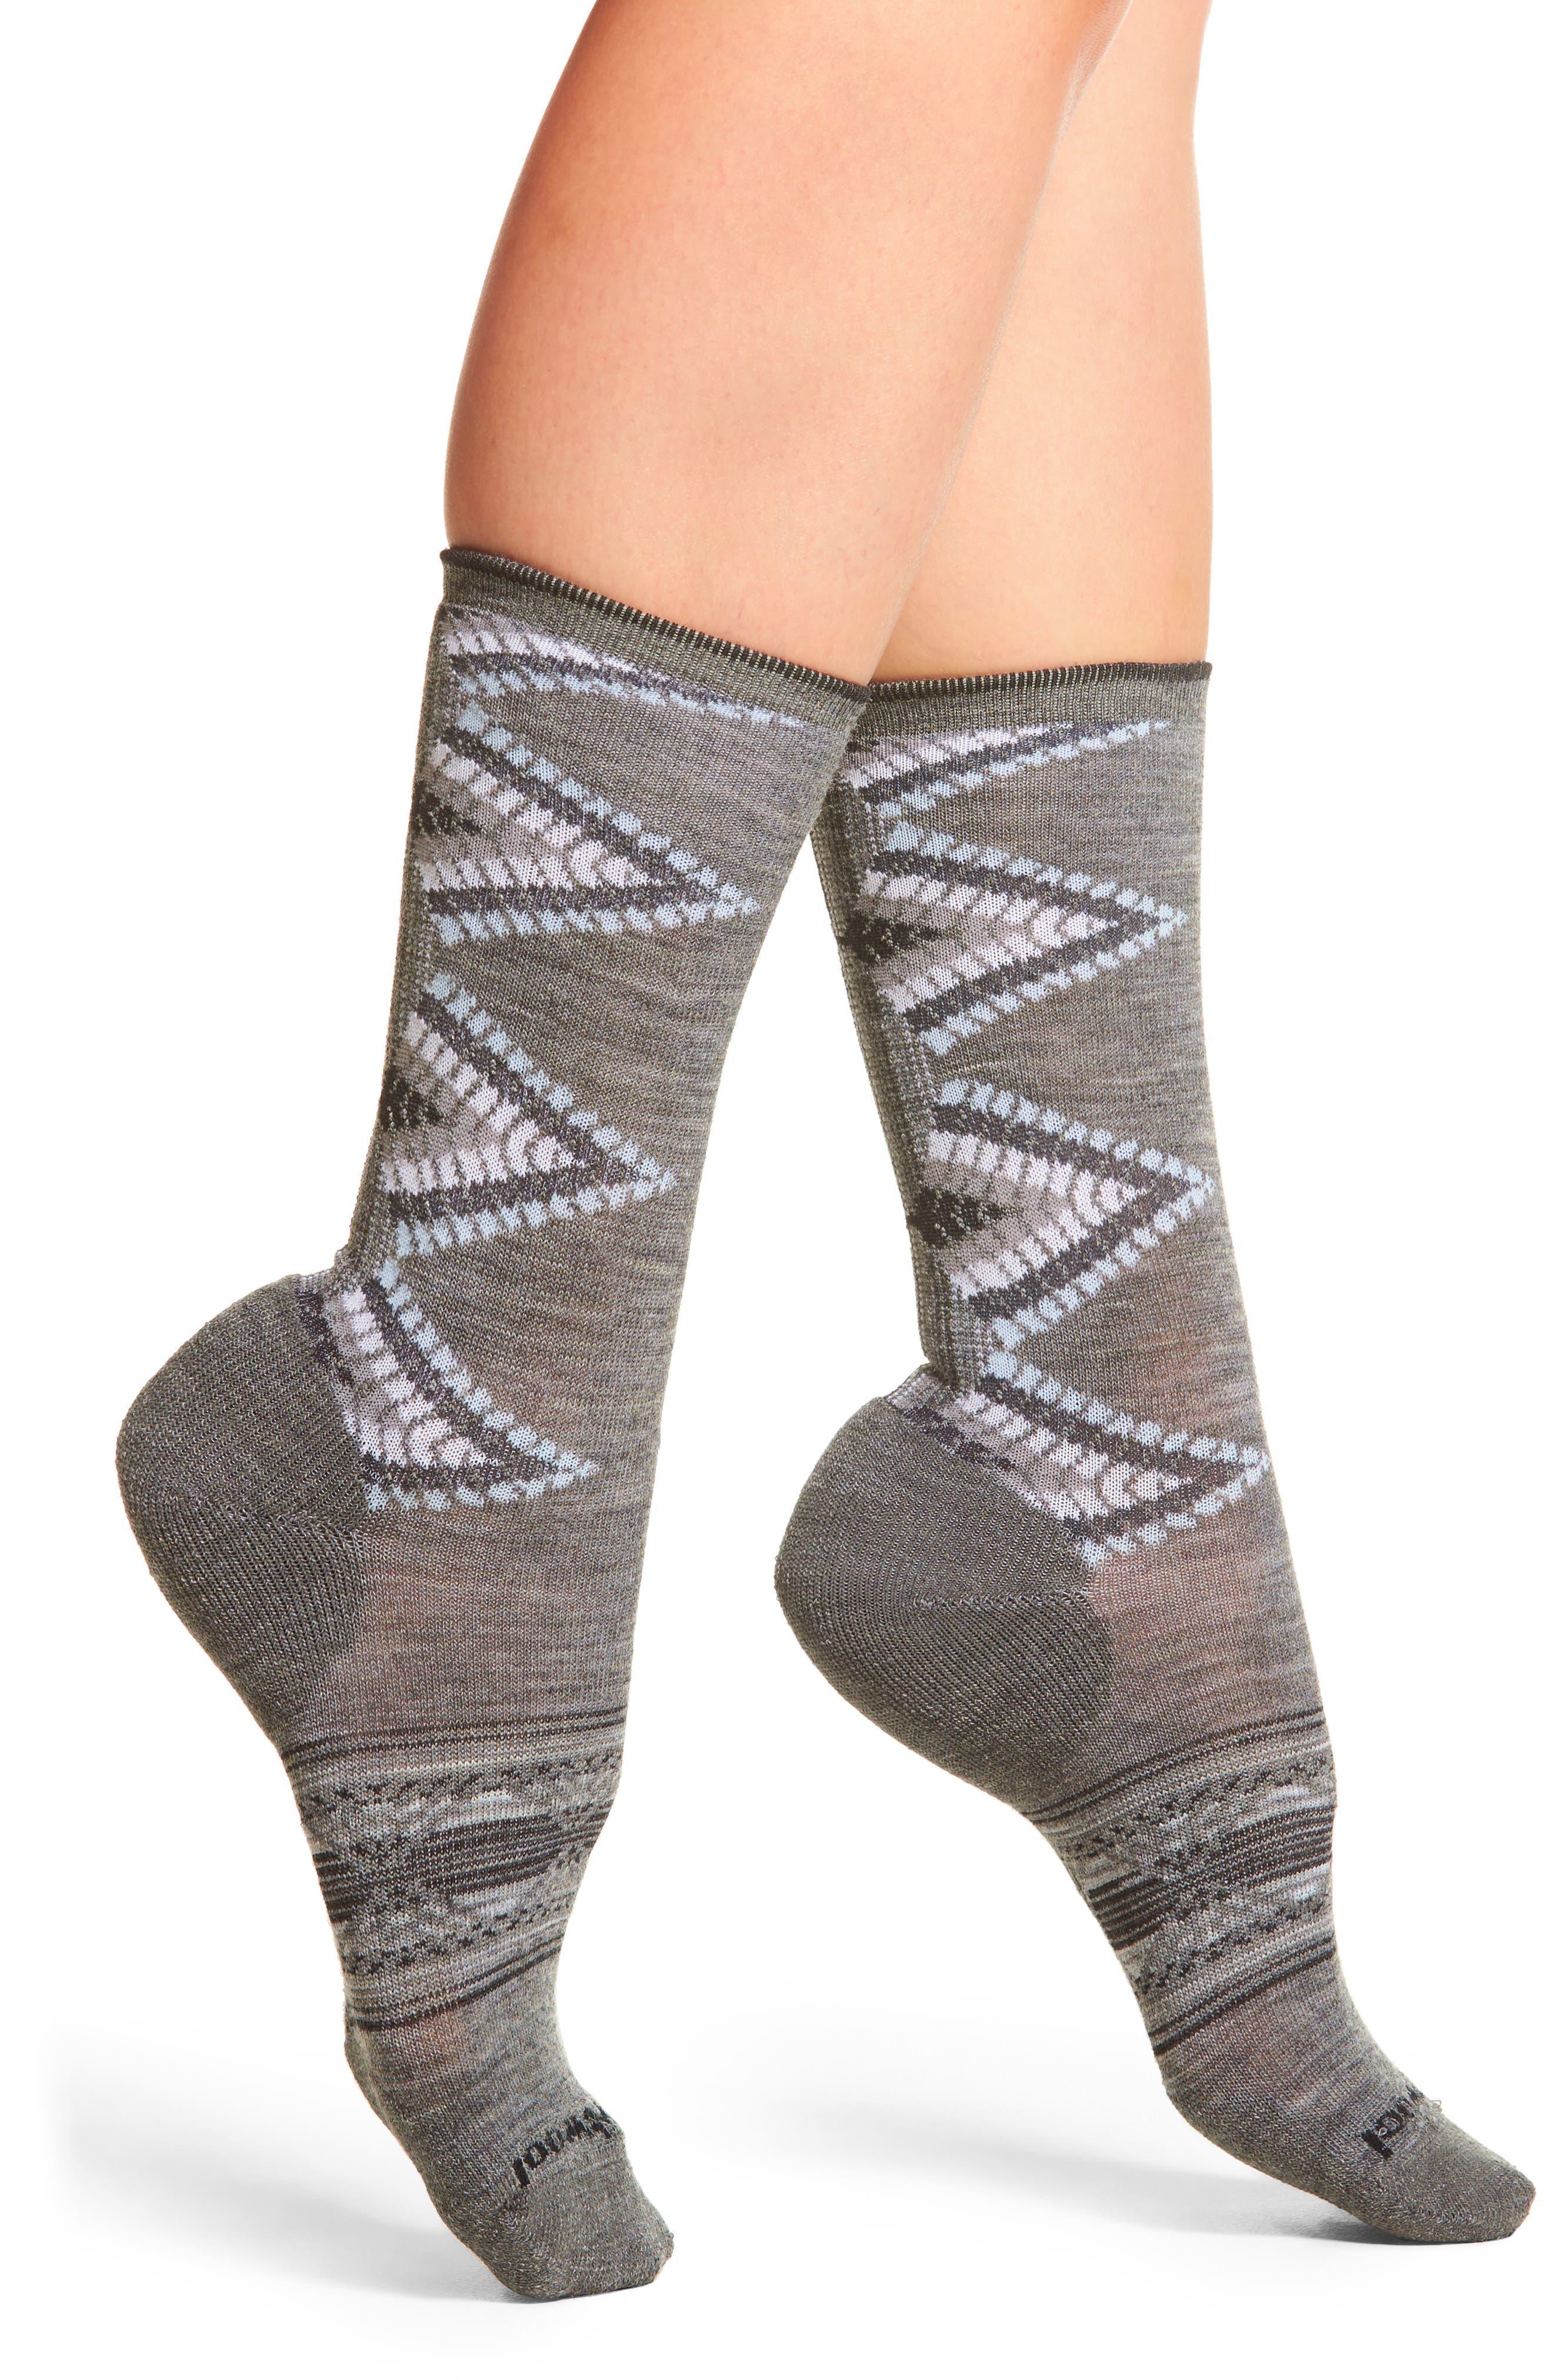 Tiva Crew Socks,                         Main,                         color, Medium Gray Heather